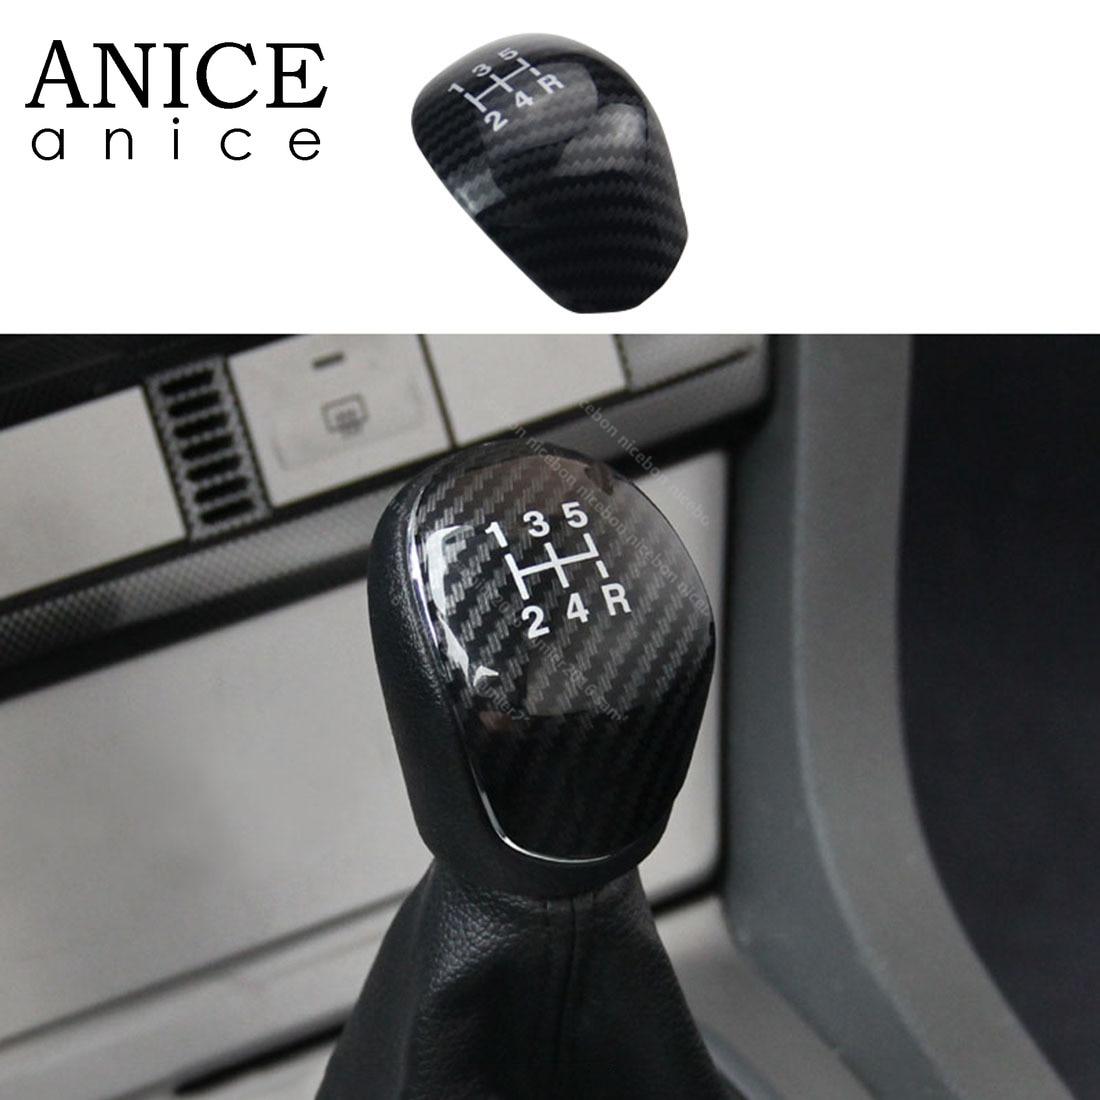 Carbon Fiber Color Gear Shift Knob Cover Trim Fit For Ford Focus 2012-2018 ABS MT